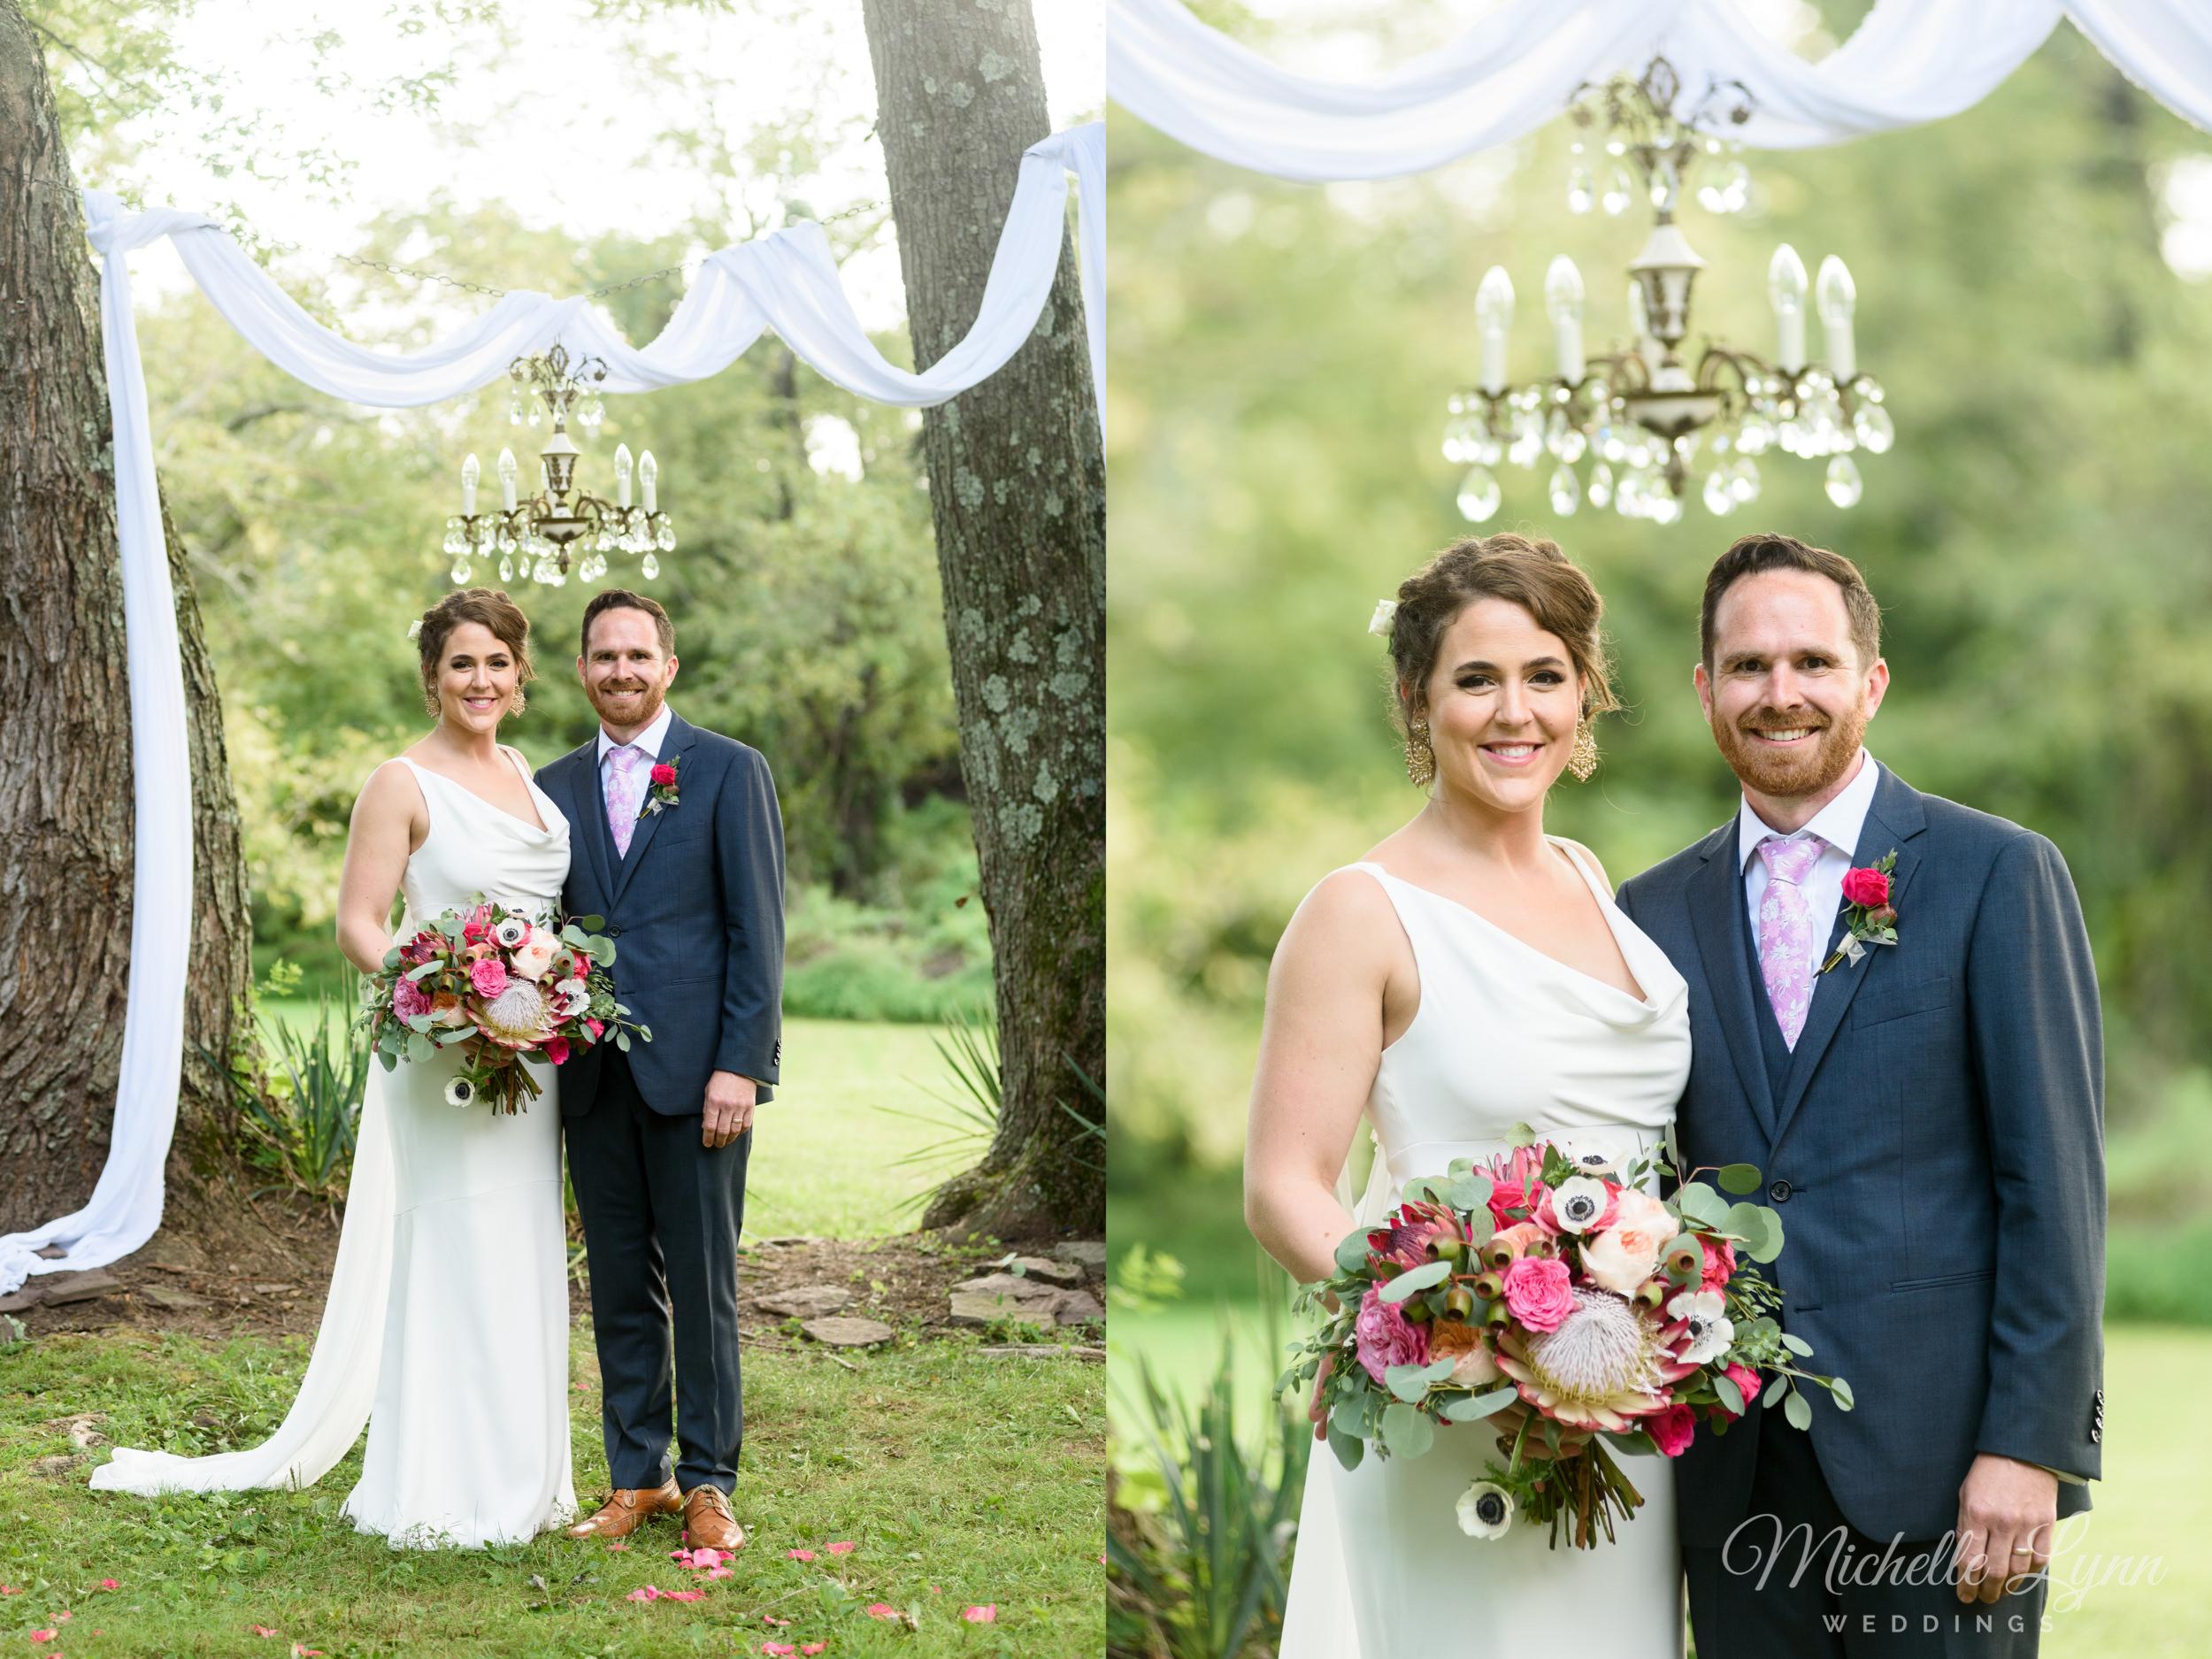 mlw-unionville-vineyards-nj-wedding-photography-49.jpg